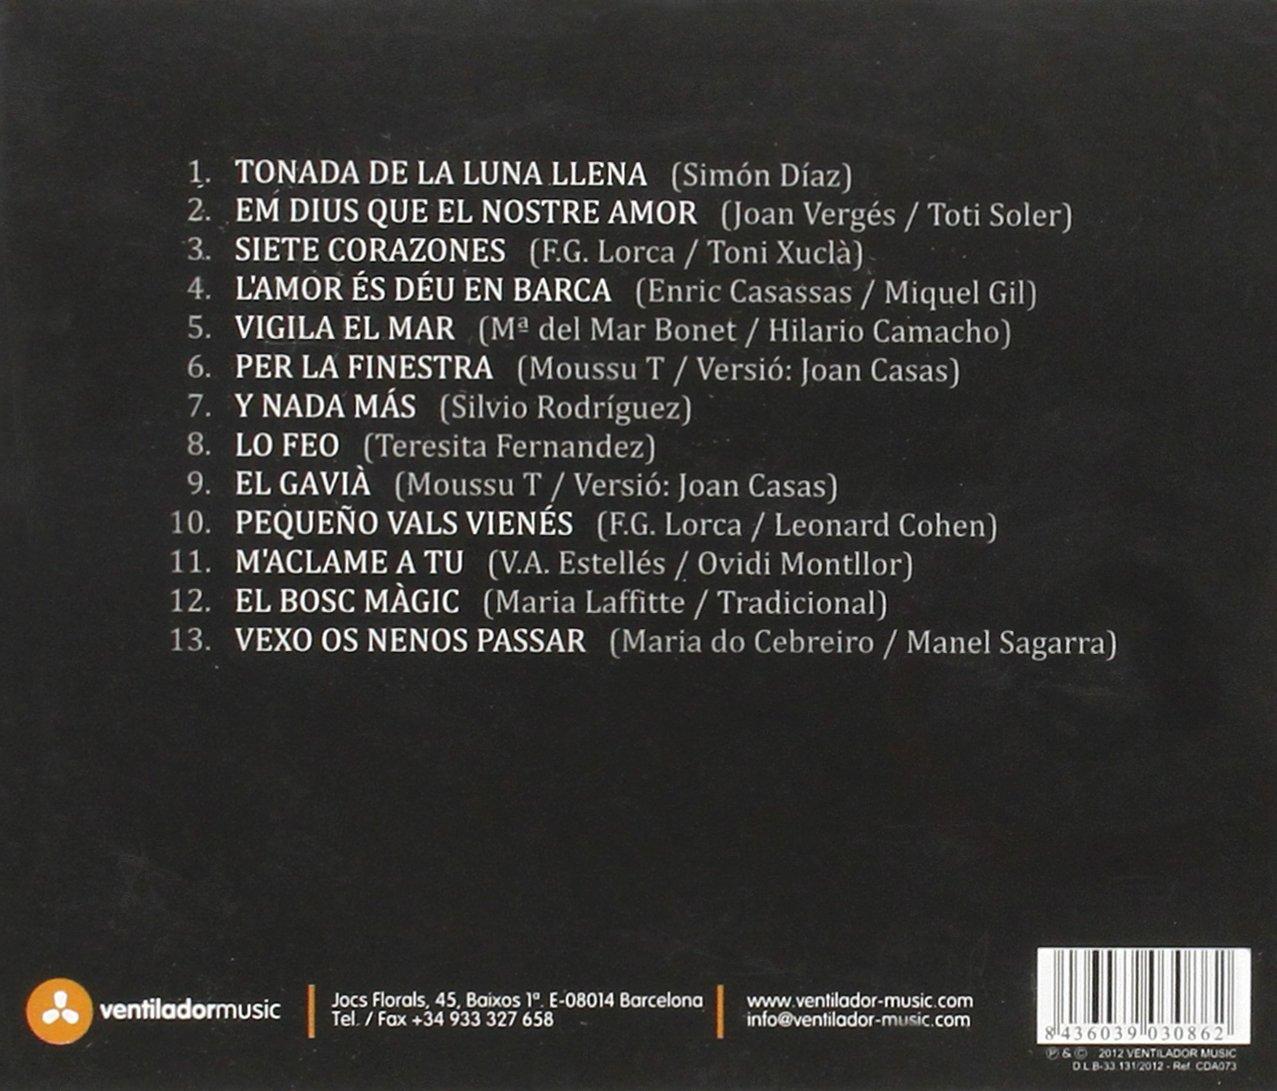 La Vida…anar tirant: Ester Formosa & Adolfo Osta: Amazon.es: Música